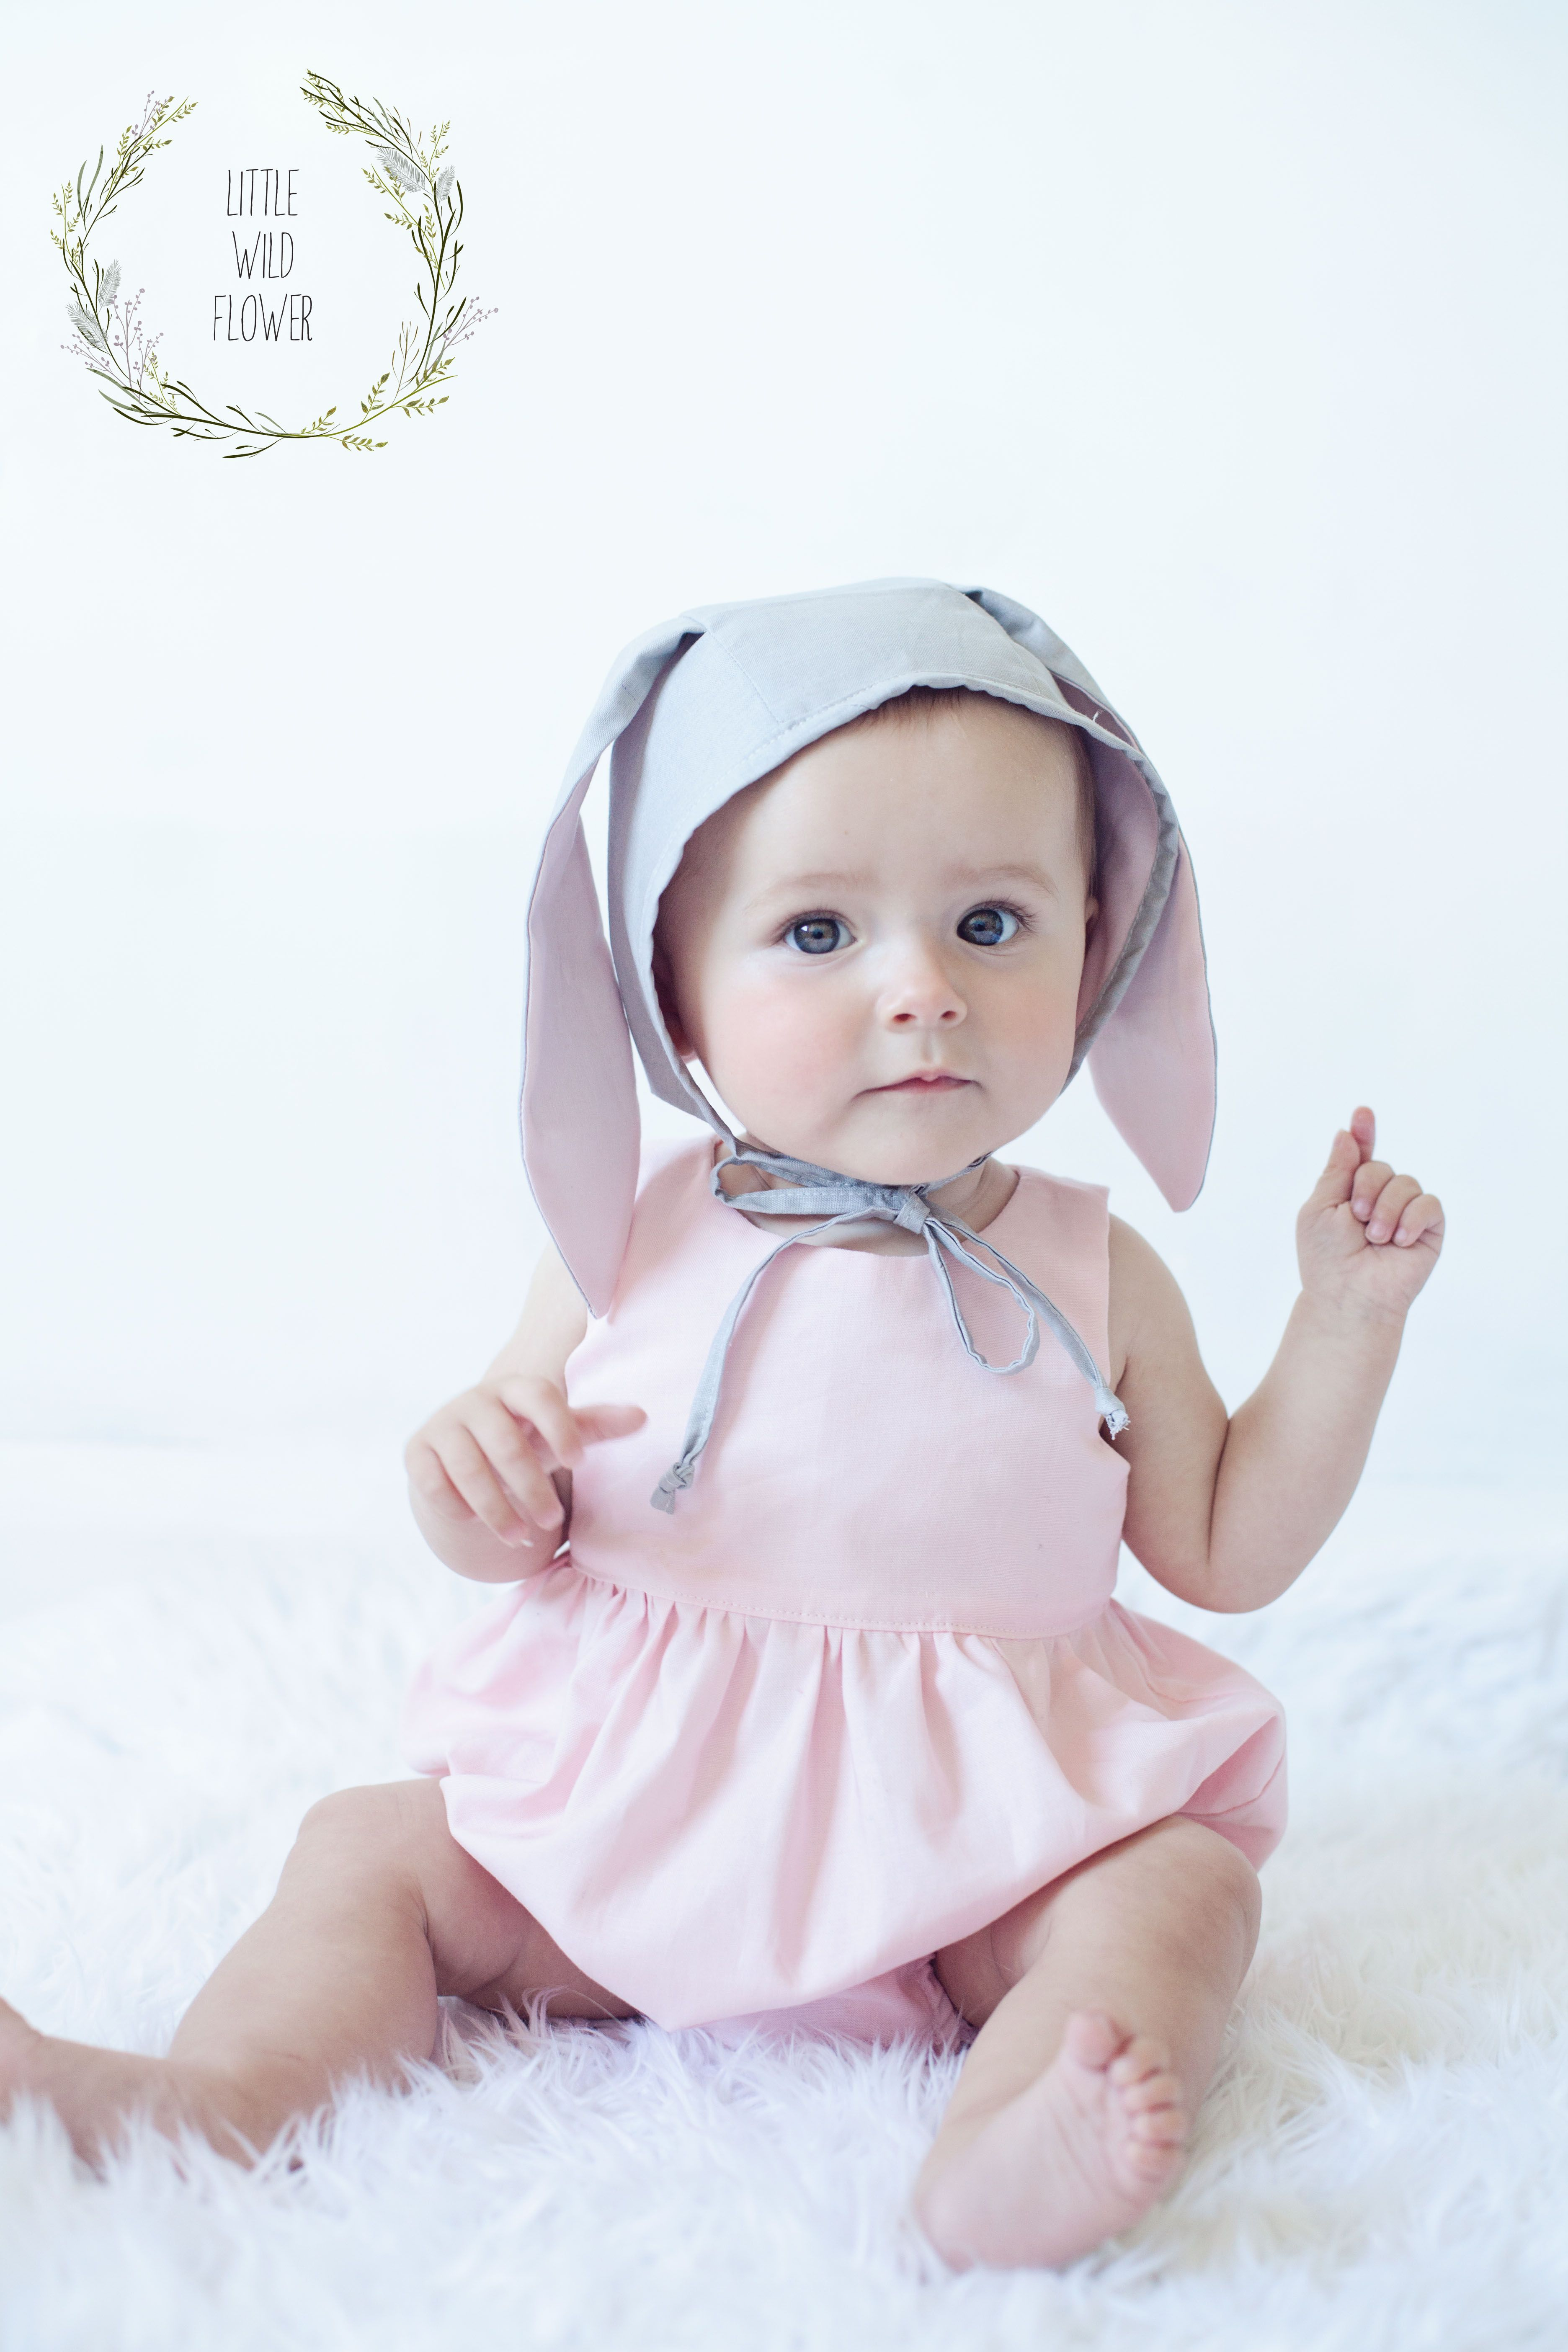 Baby Tea Party Playsuit & Purl Soho Bonnet Easter Bunny | LITTLE ...